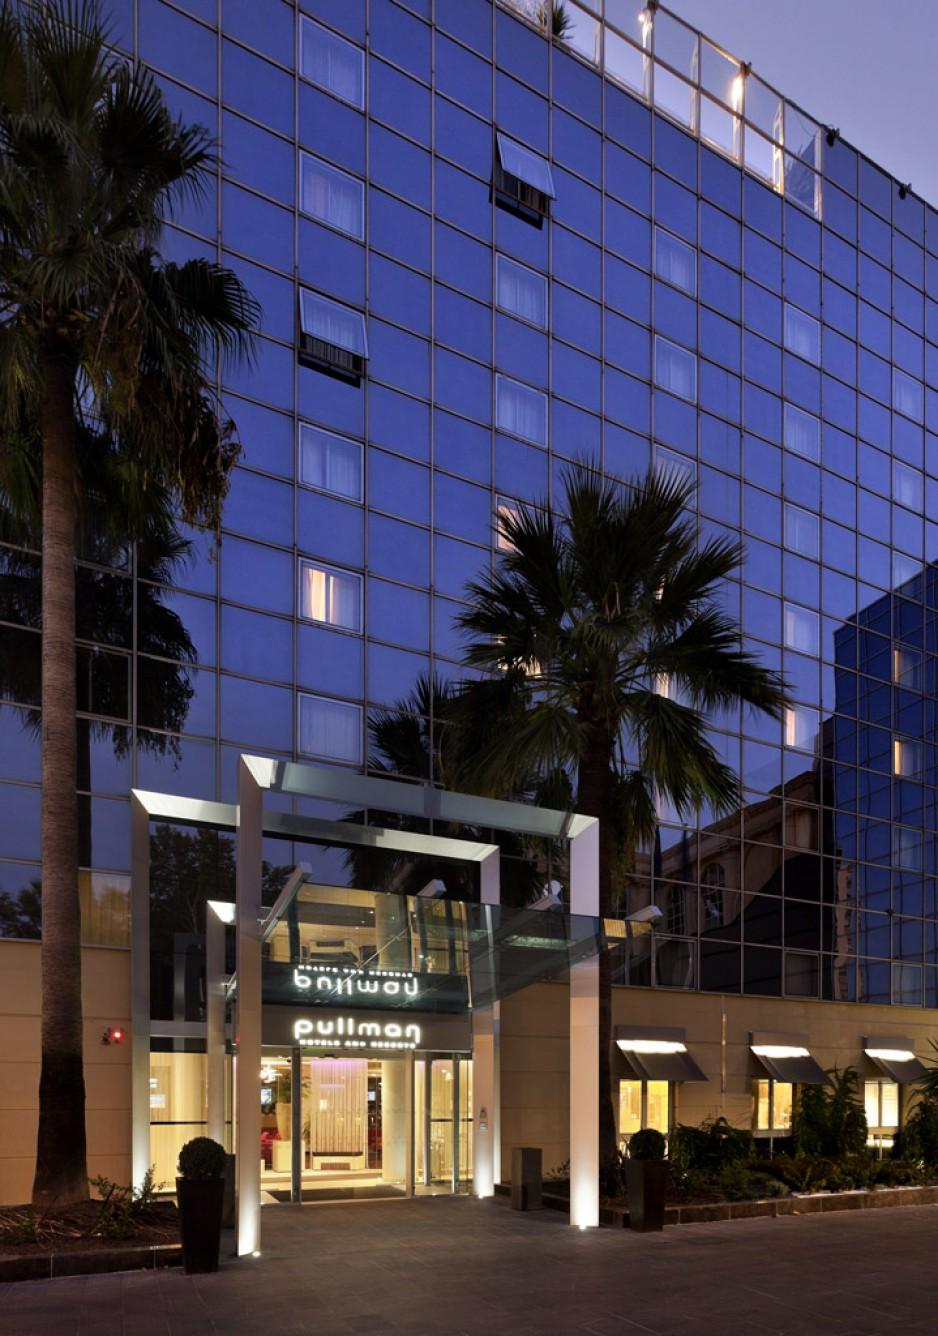 H tel journ e montpellier pullman montpellier centre for Hotels montpellier